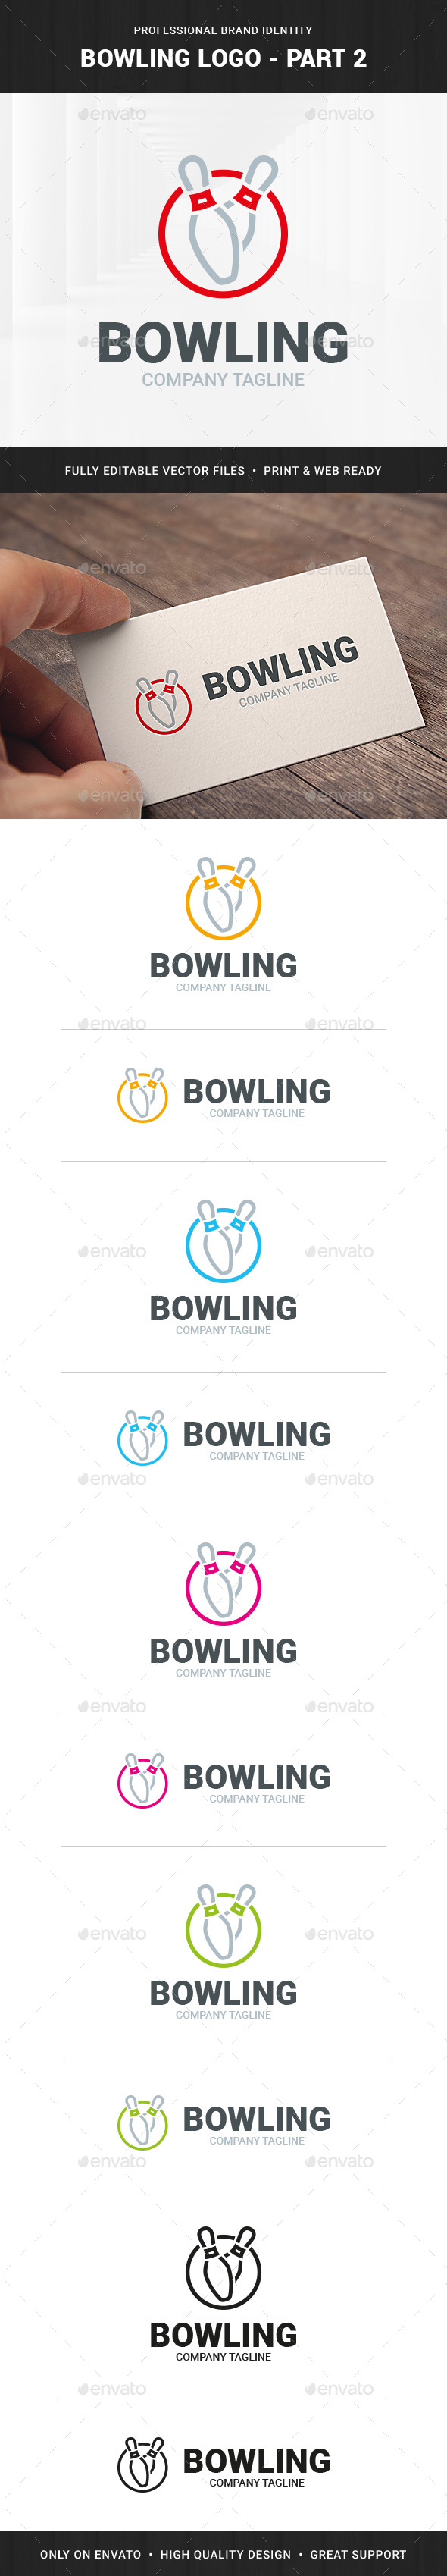 Bowling Logo Template - Part 2